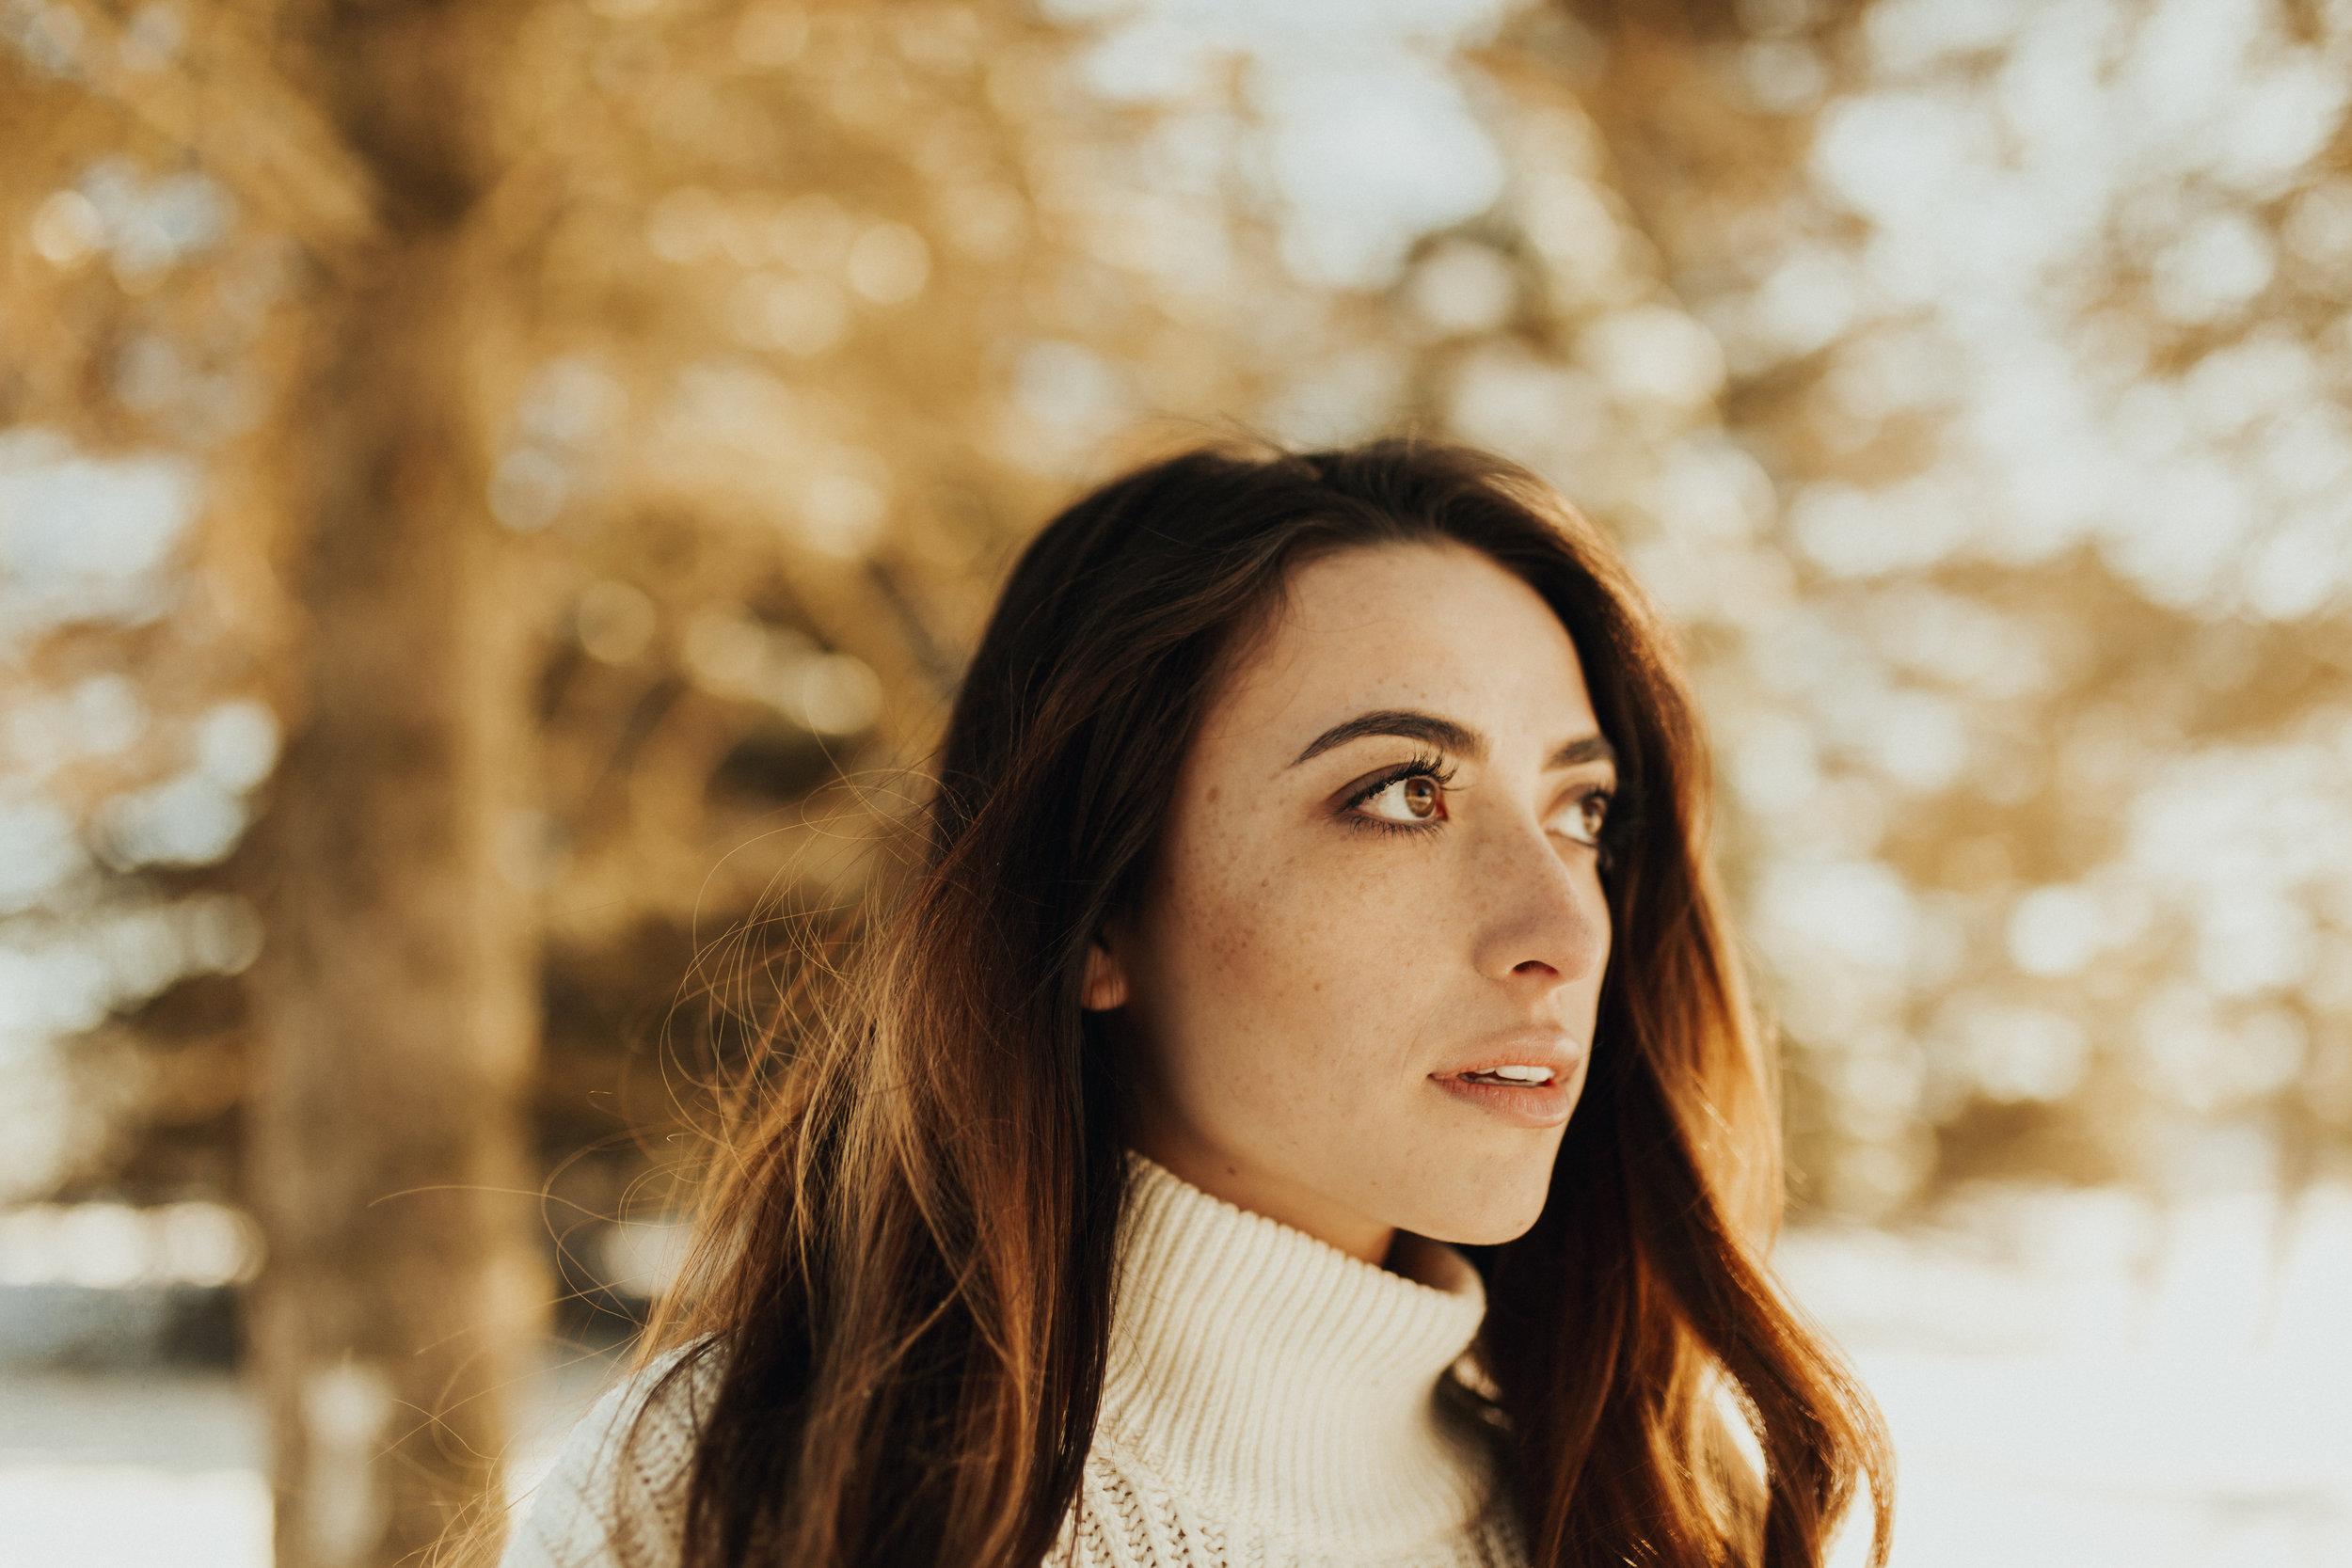 Arianna_Portraiture_25.jpg